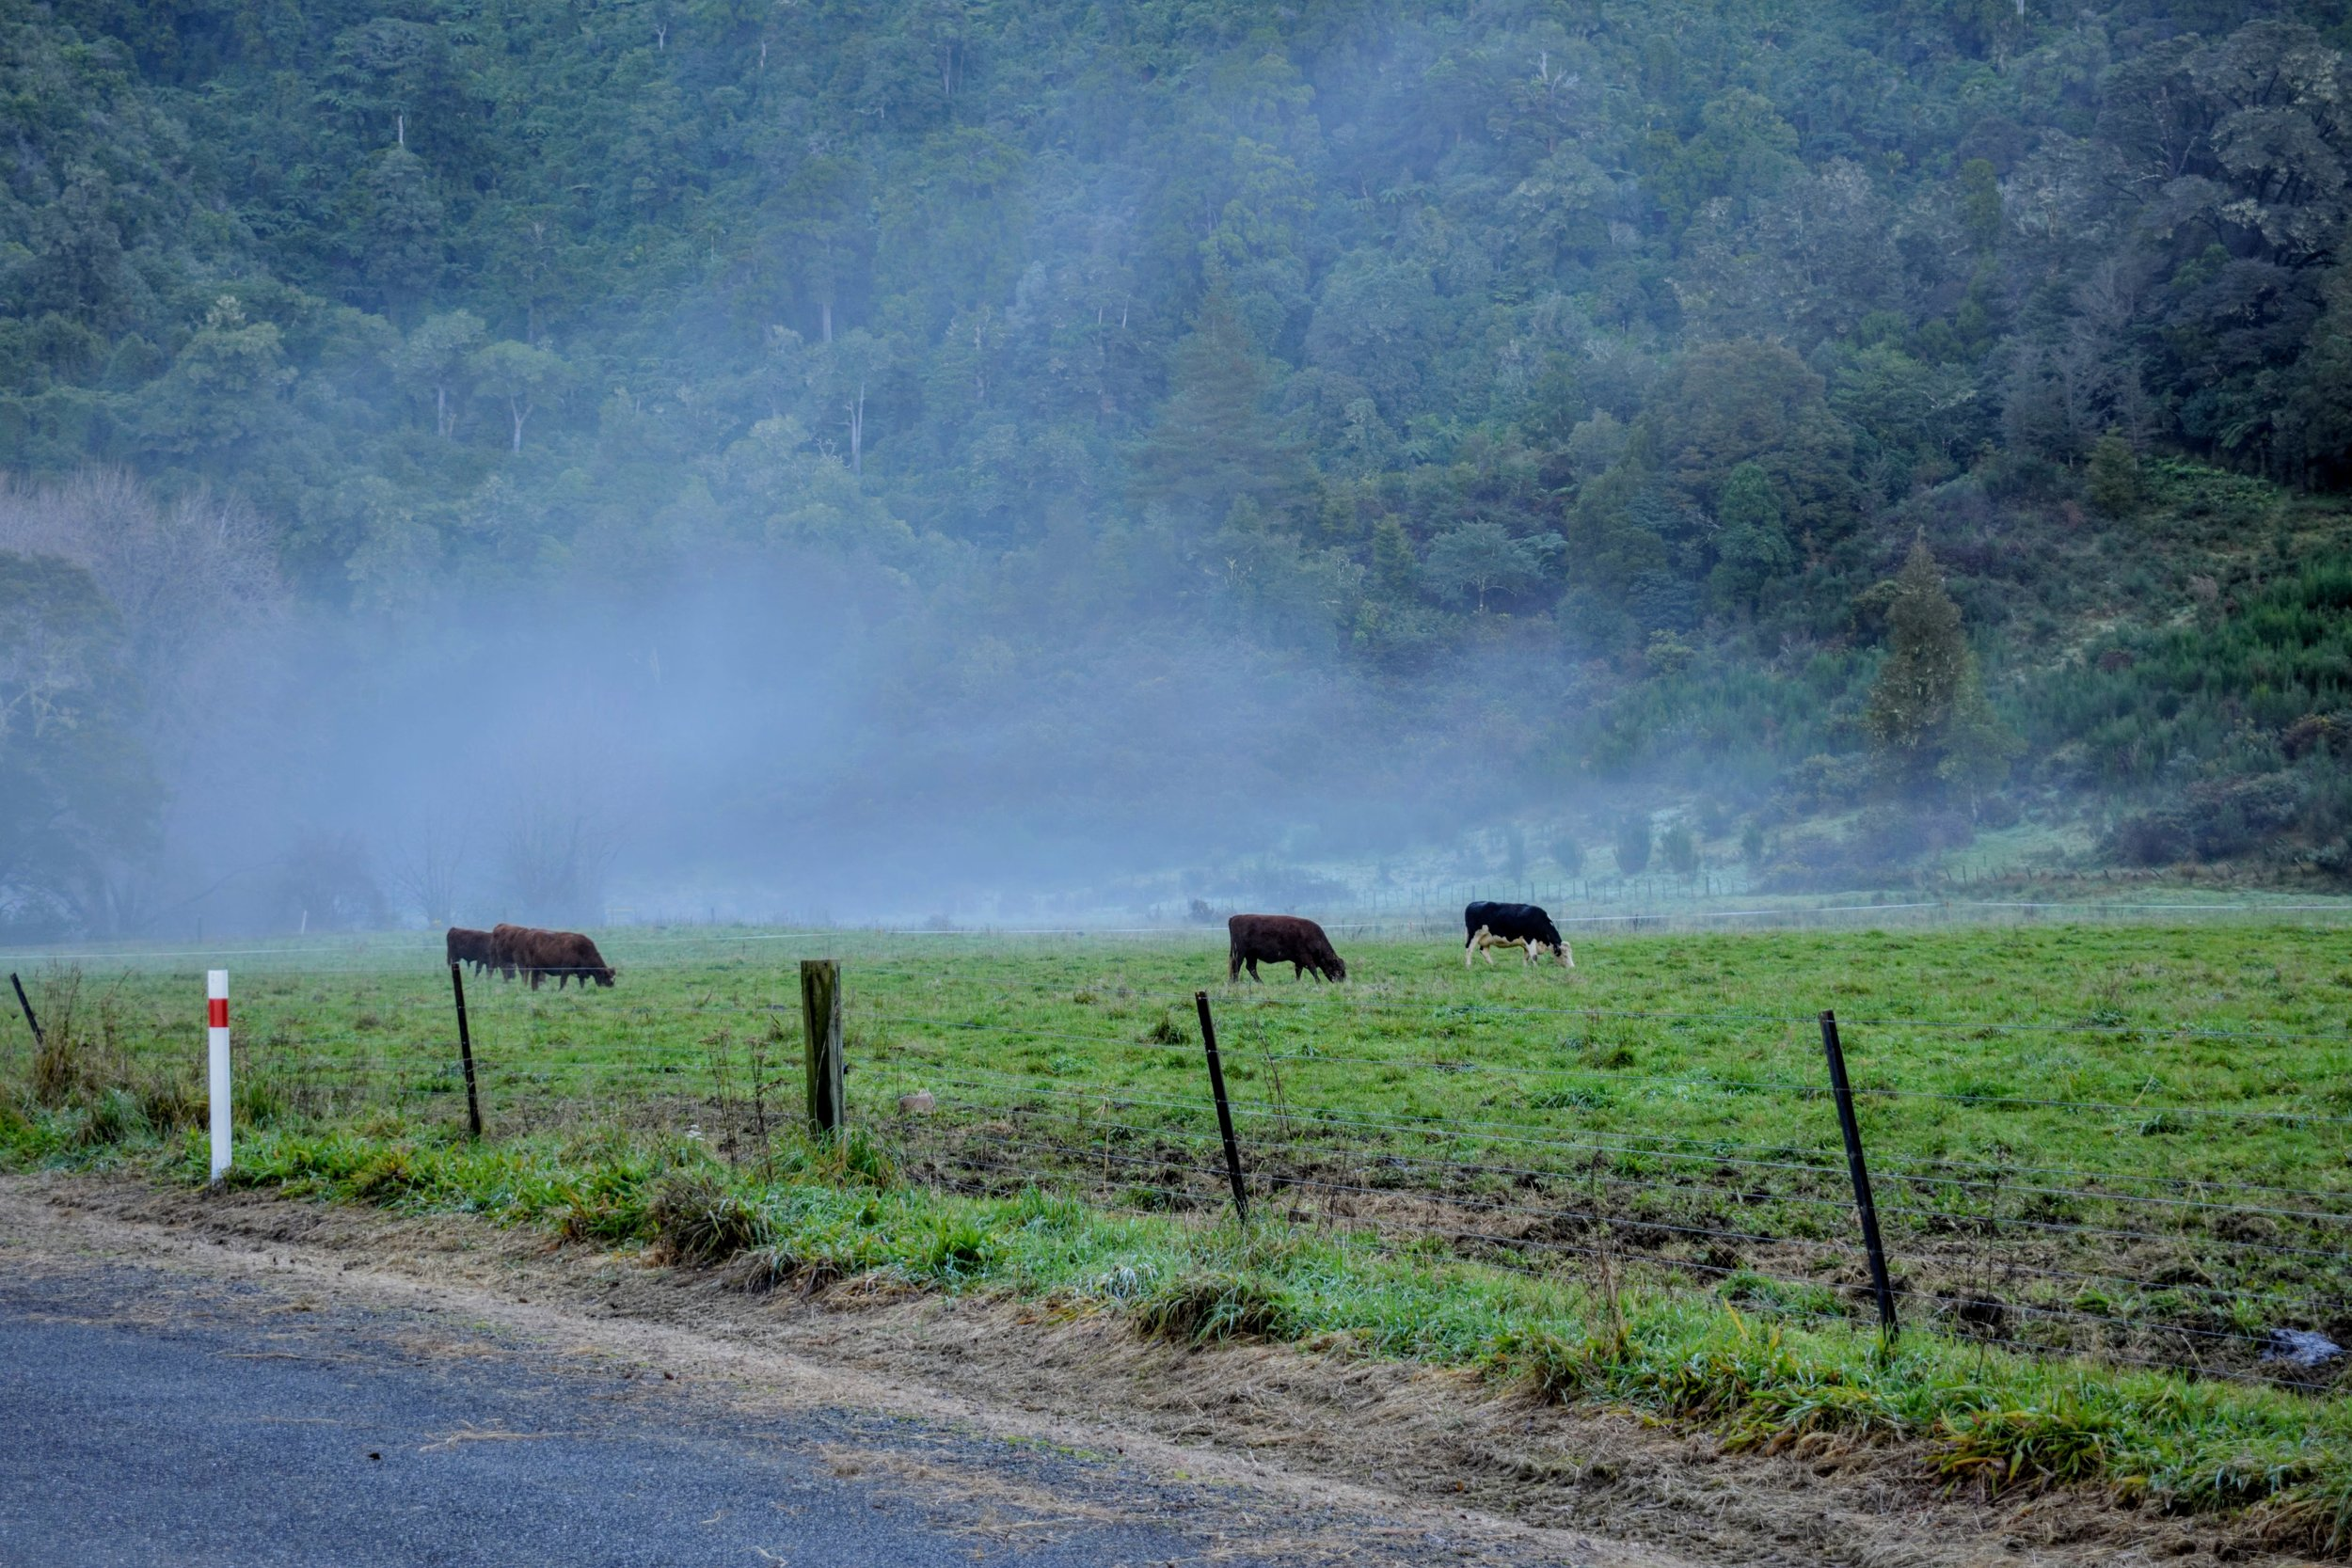 Steamy cattle near the Riwaka Resurgence